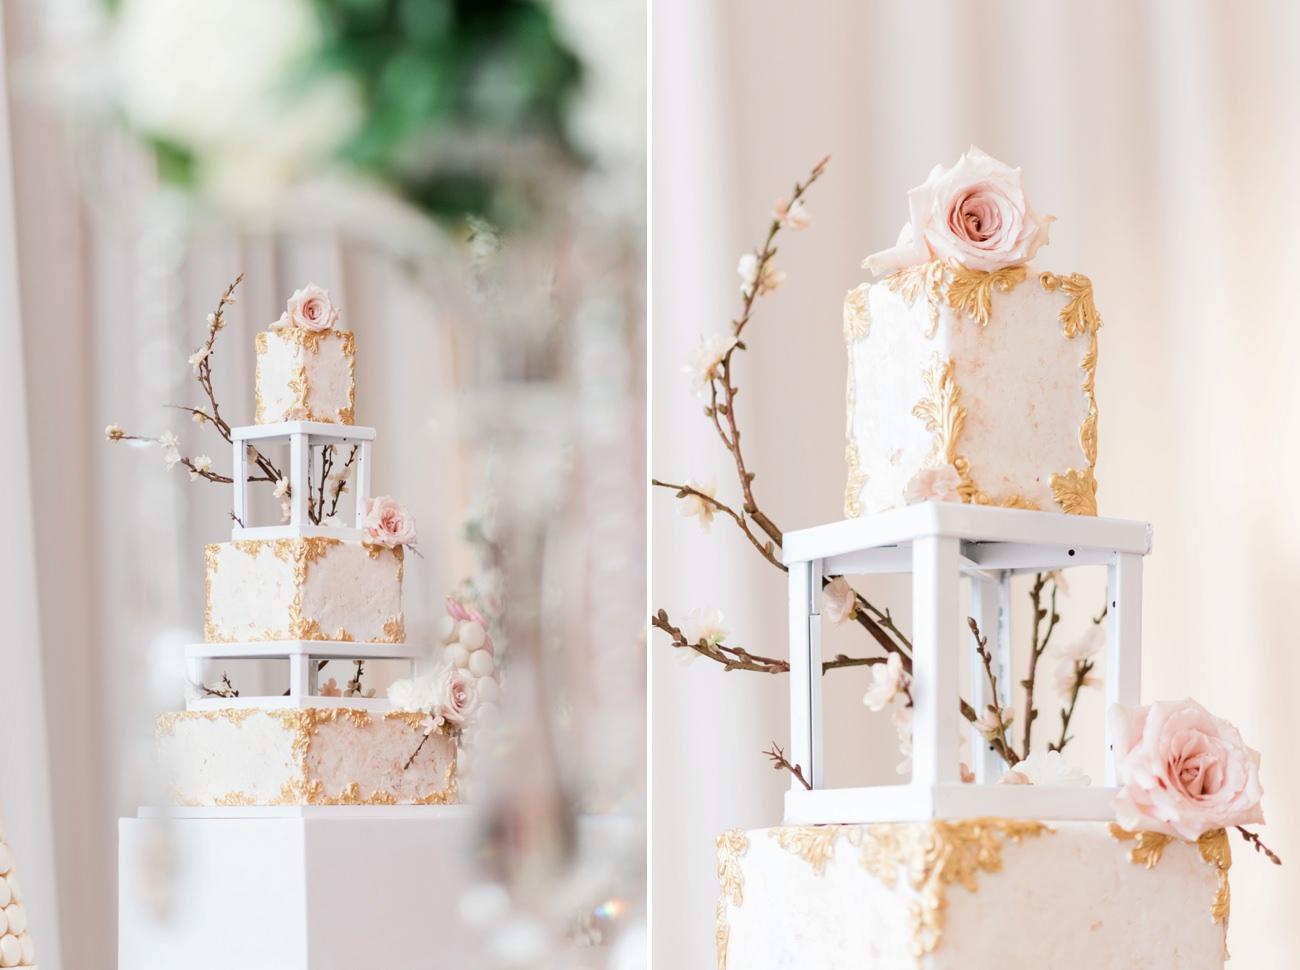 arlington-estate-winter-wedding-reception-details-cake-1.jpg